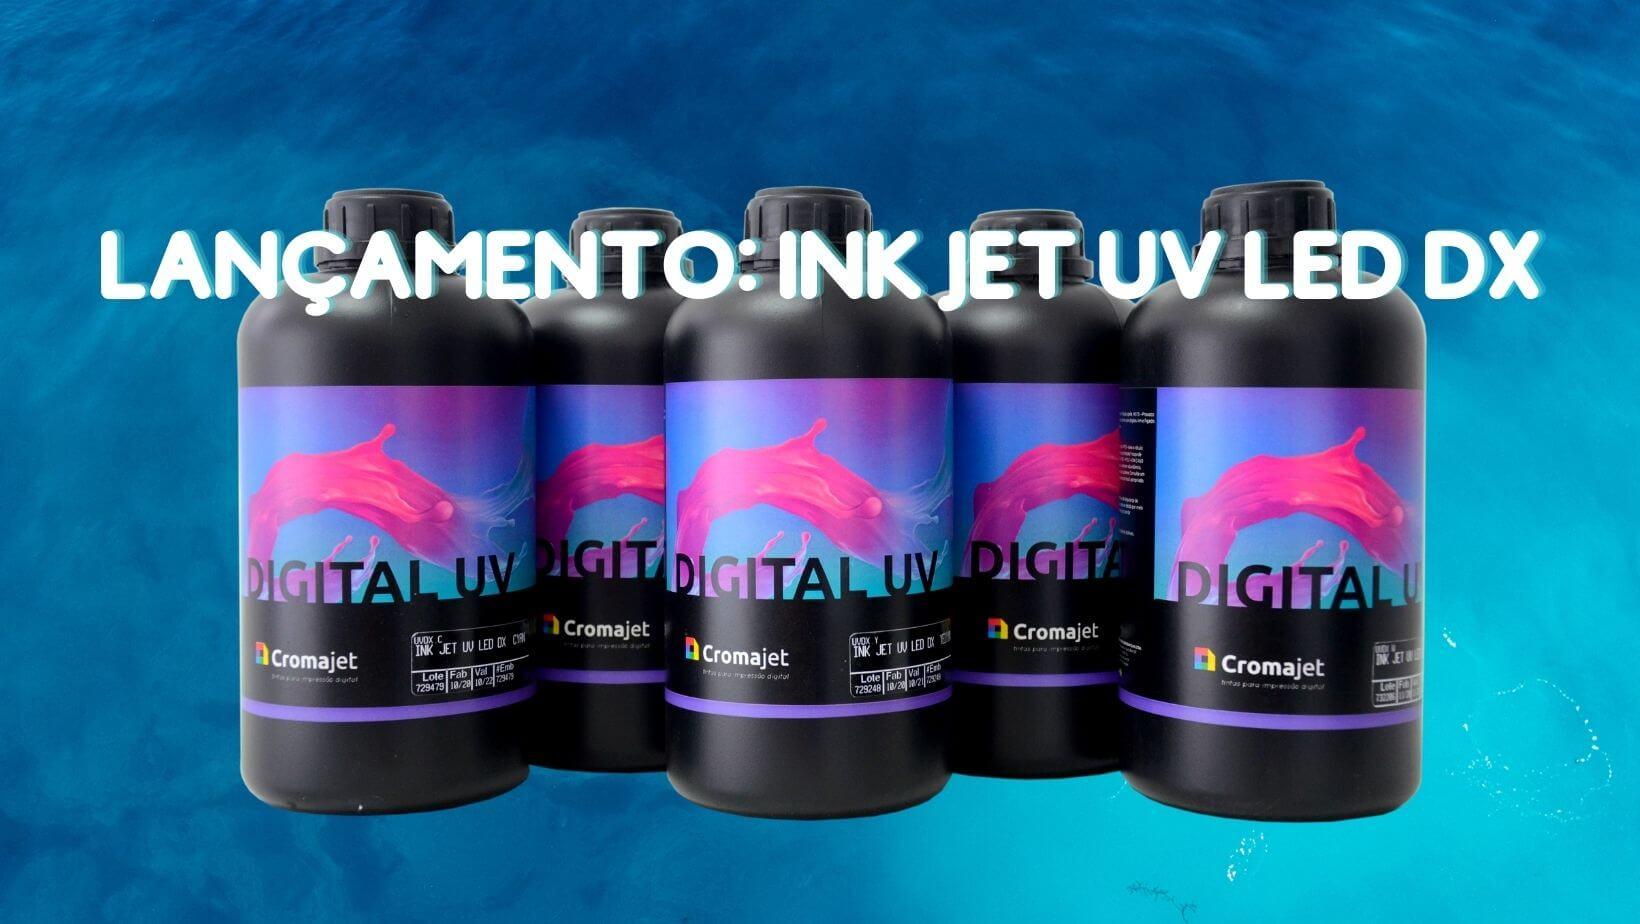 INK JET UV LED DX